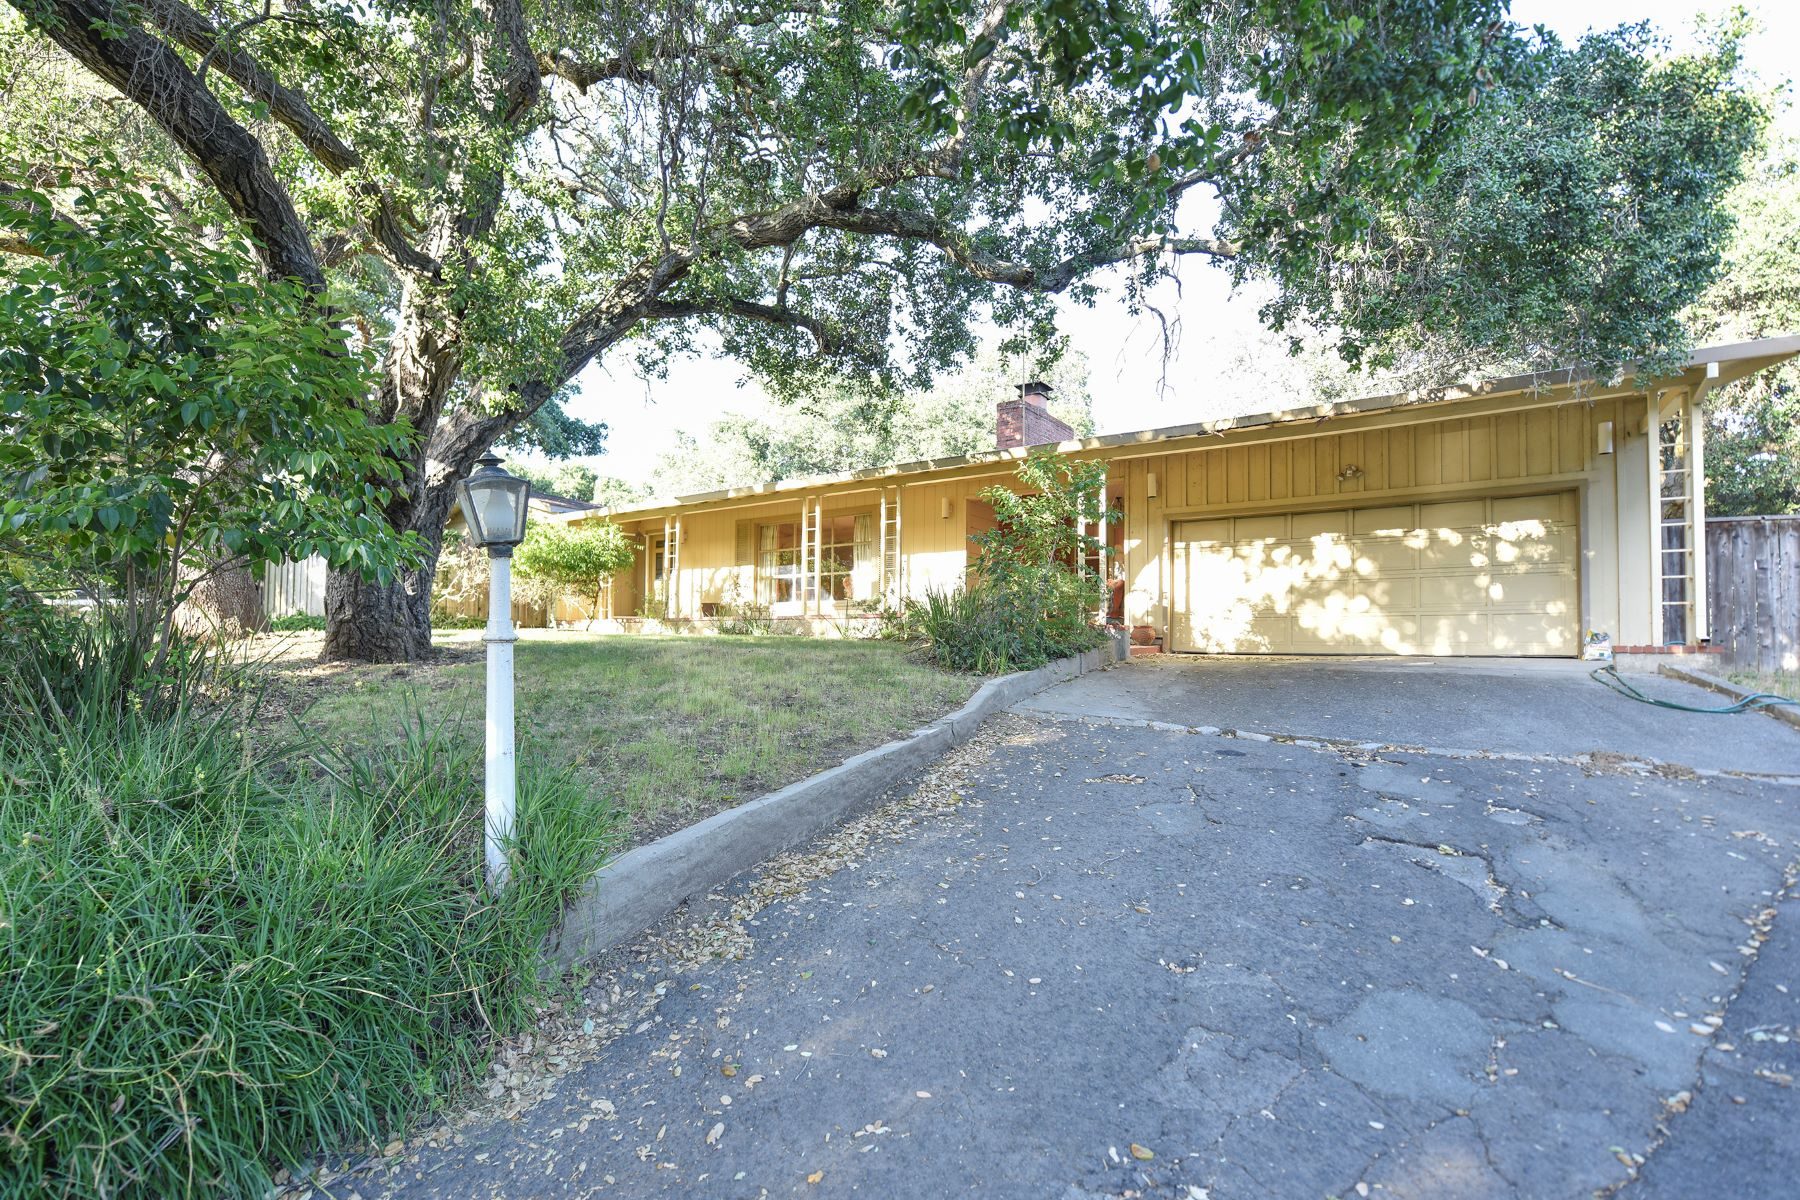 Moradia para Venda às An Inspiring Home in Montecito Heights 77 El Nido Drive Napa, Califórnia, 94559 Estados Unidos